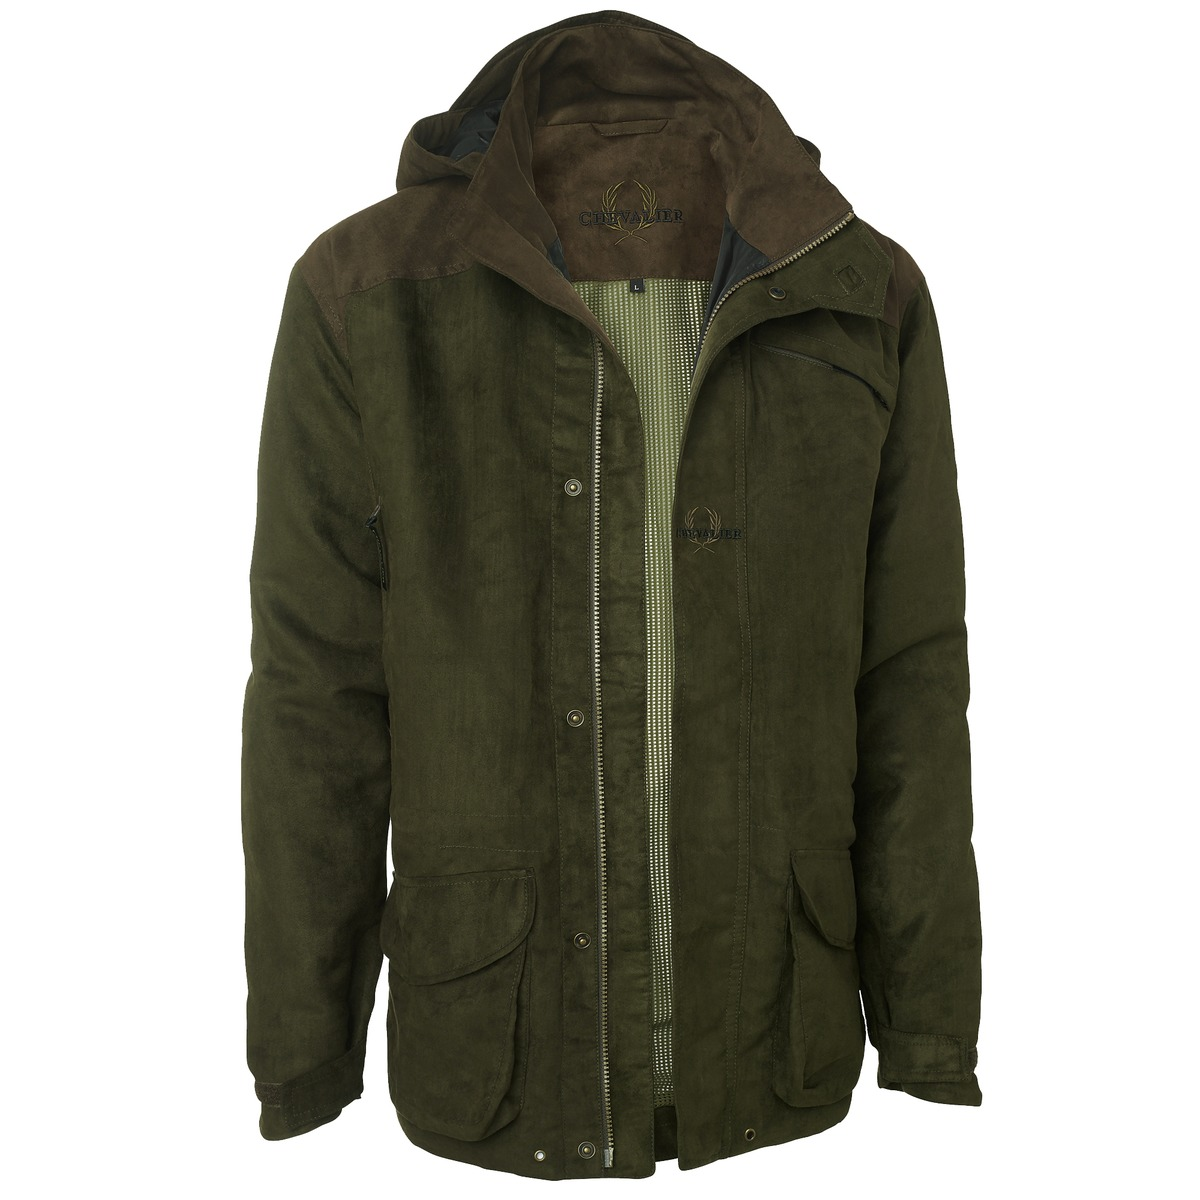 Outback Gtx Coat w hood, jaktjakke